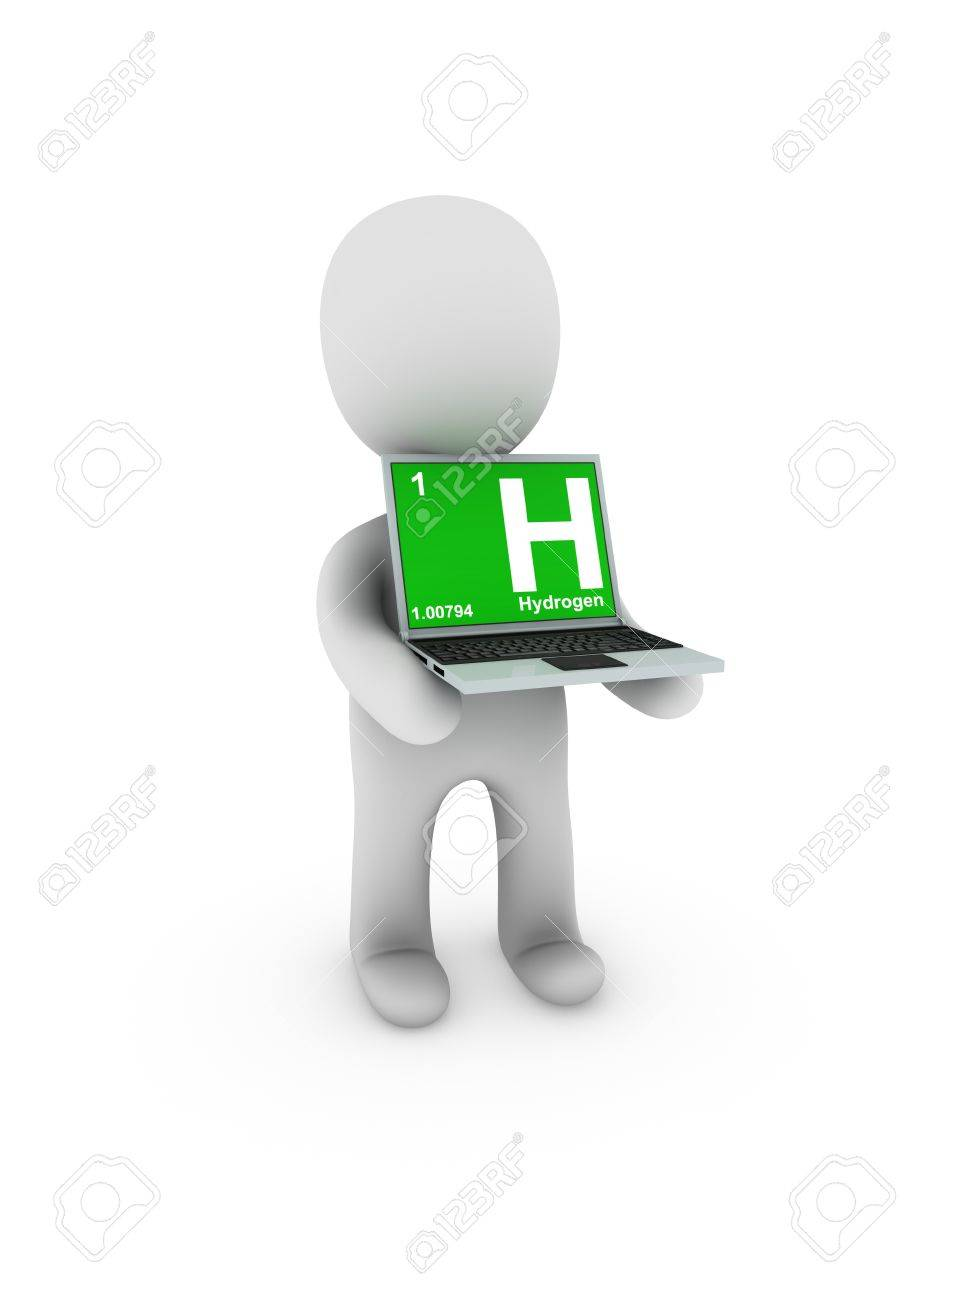 hydrogen symbol on screen laptop Stock Photo - 13538854